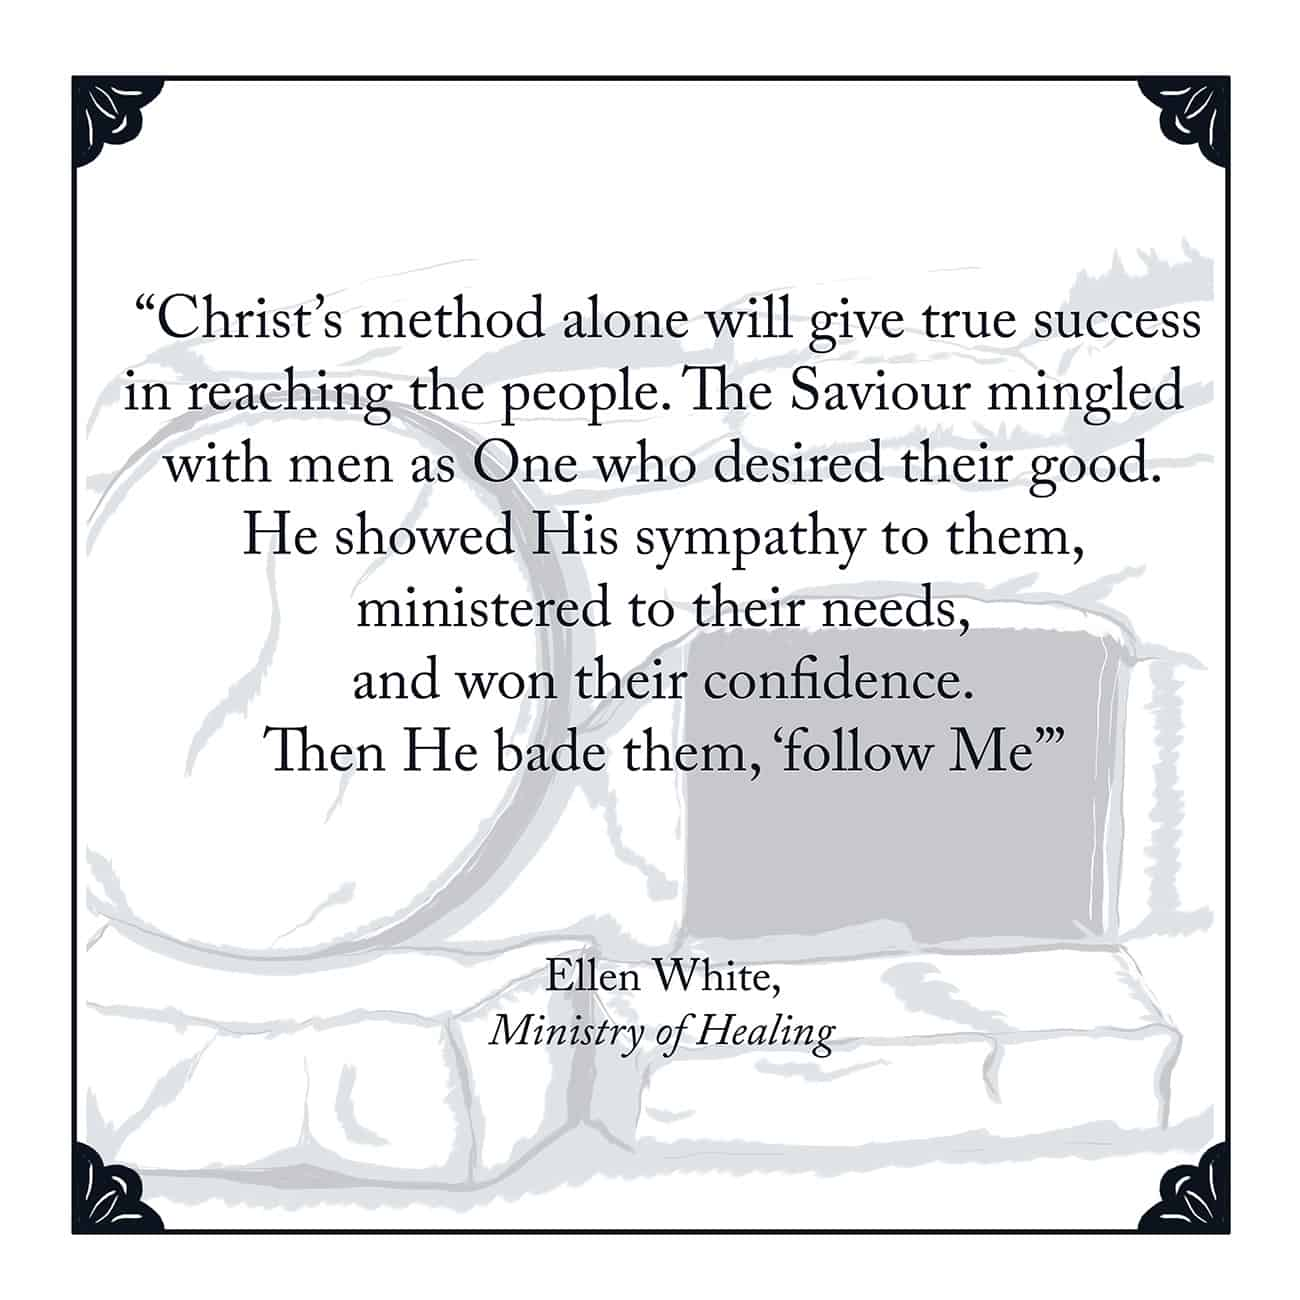 Ellen White, Ministry of Healing, p. 73